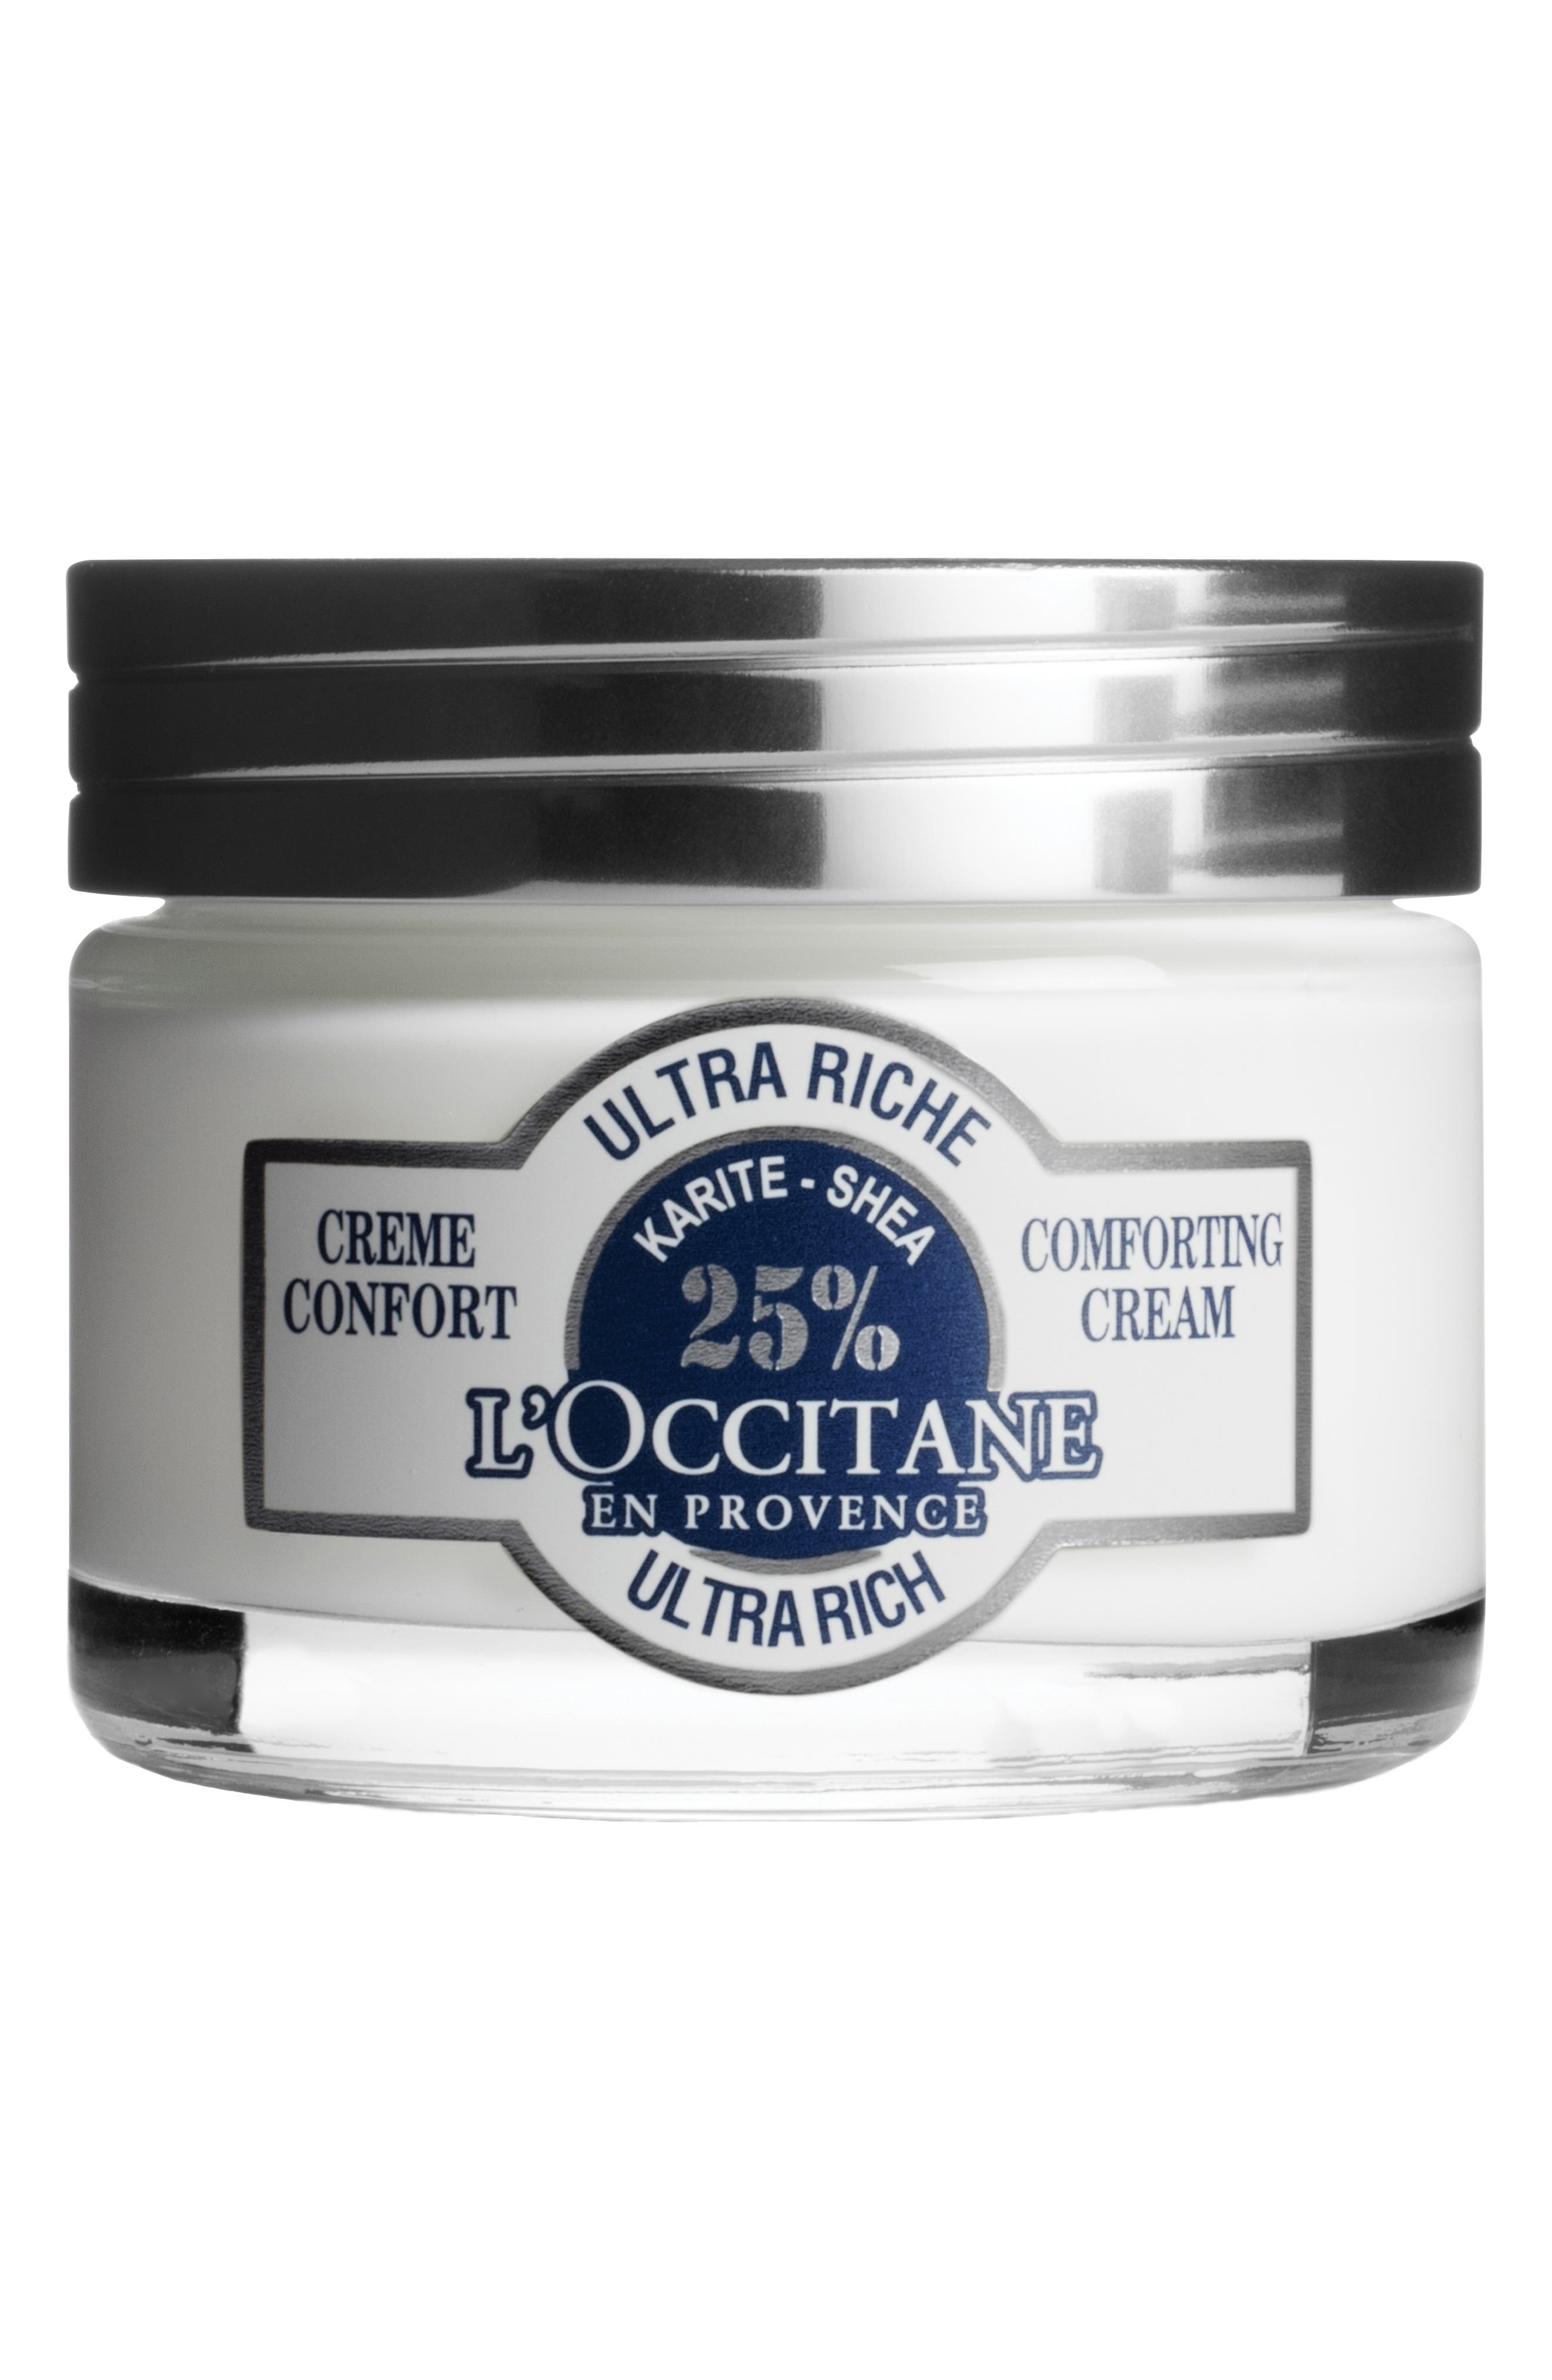 Shea Ultra Rich Comforting Cream,                             Main thumbnail 1, color,                             NO COLOR